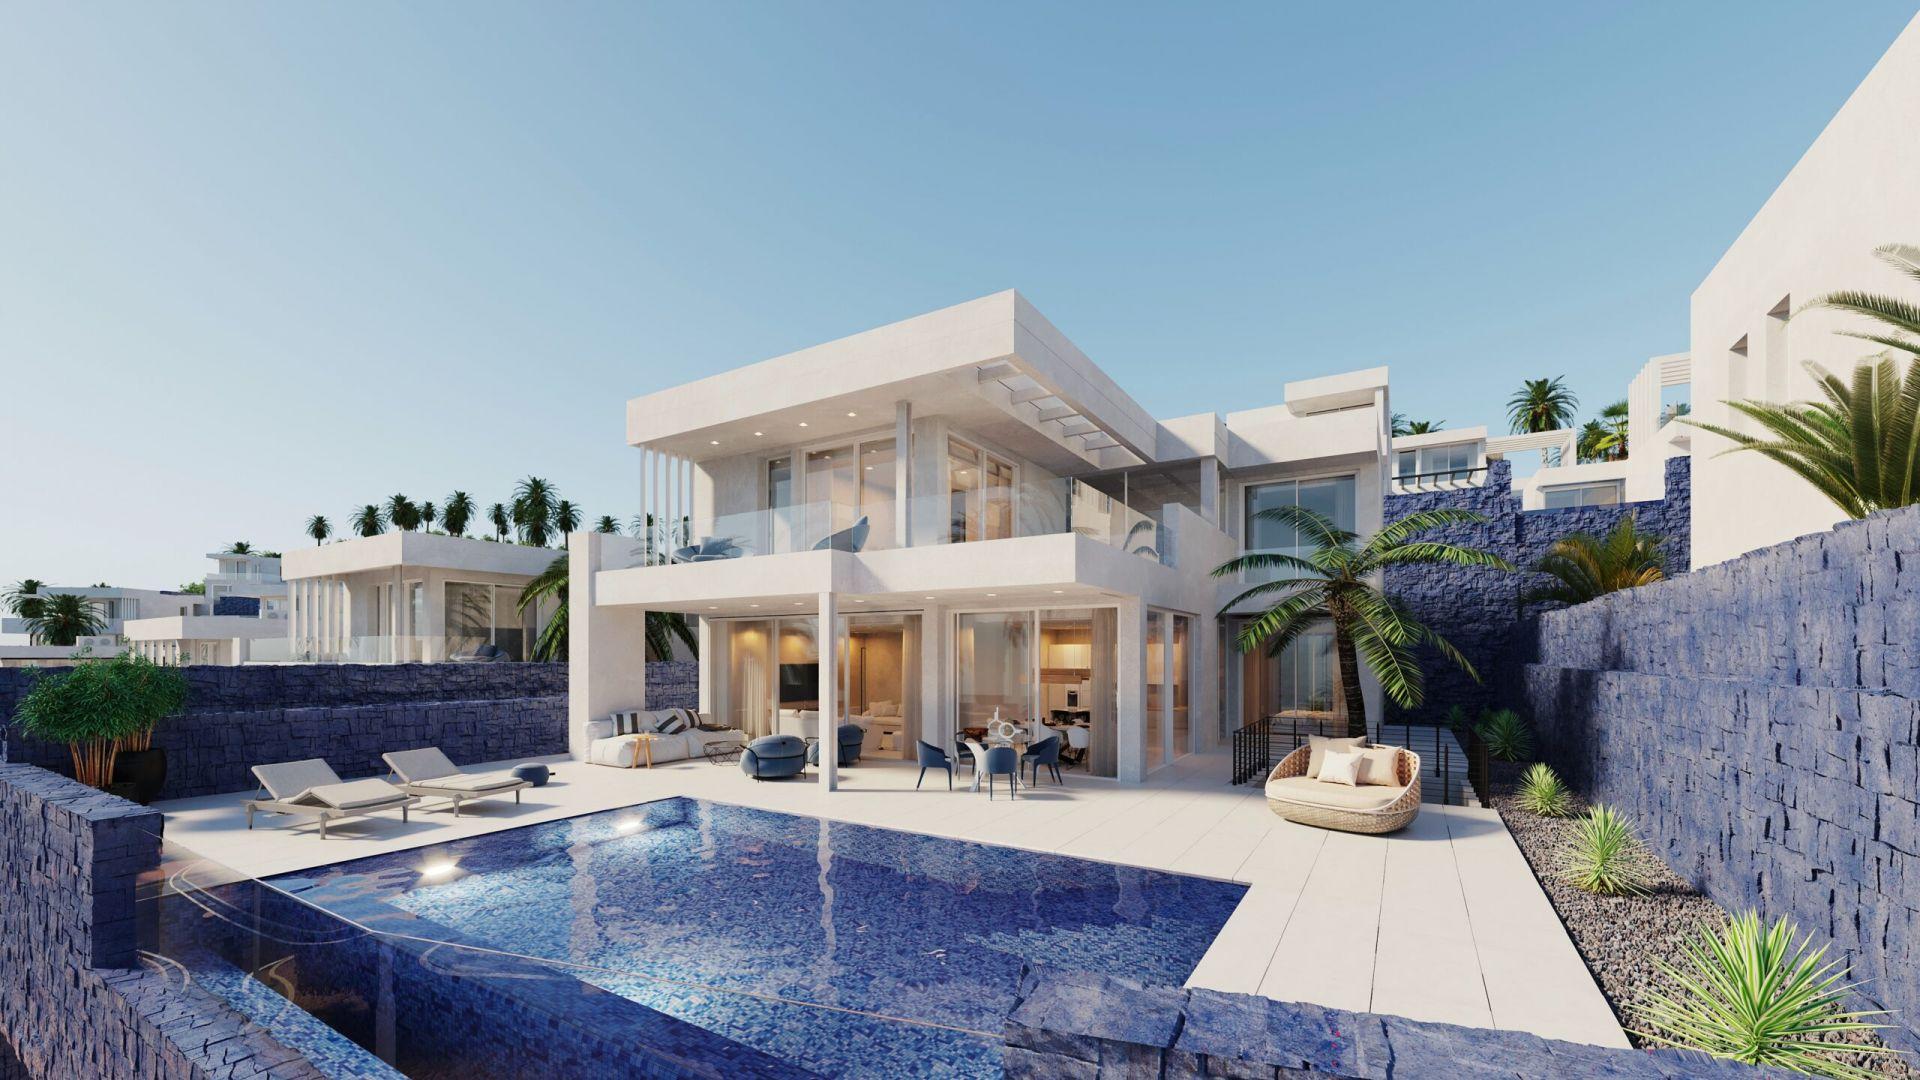 Serenity Luxury Villas Tenerife - img 4.